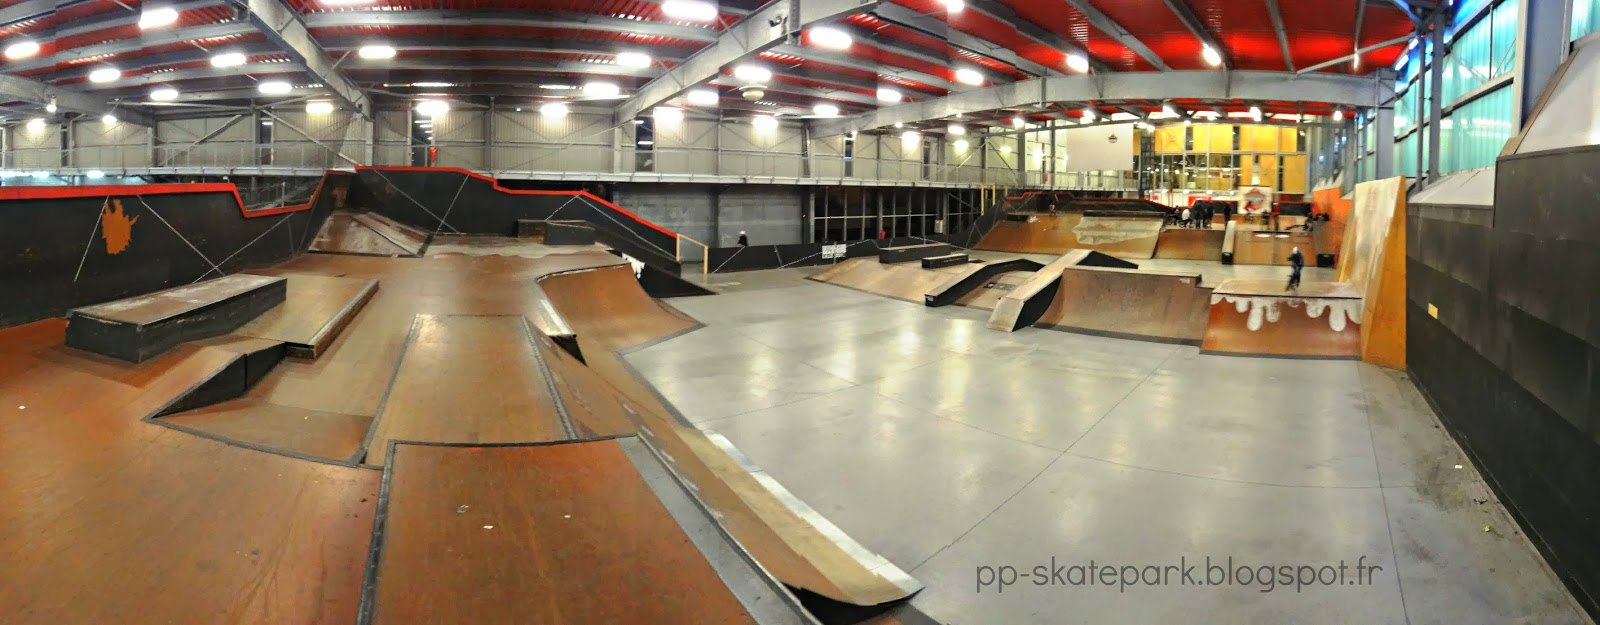 Halle de glisse lille skatepark